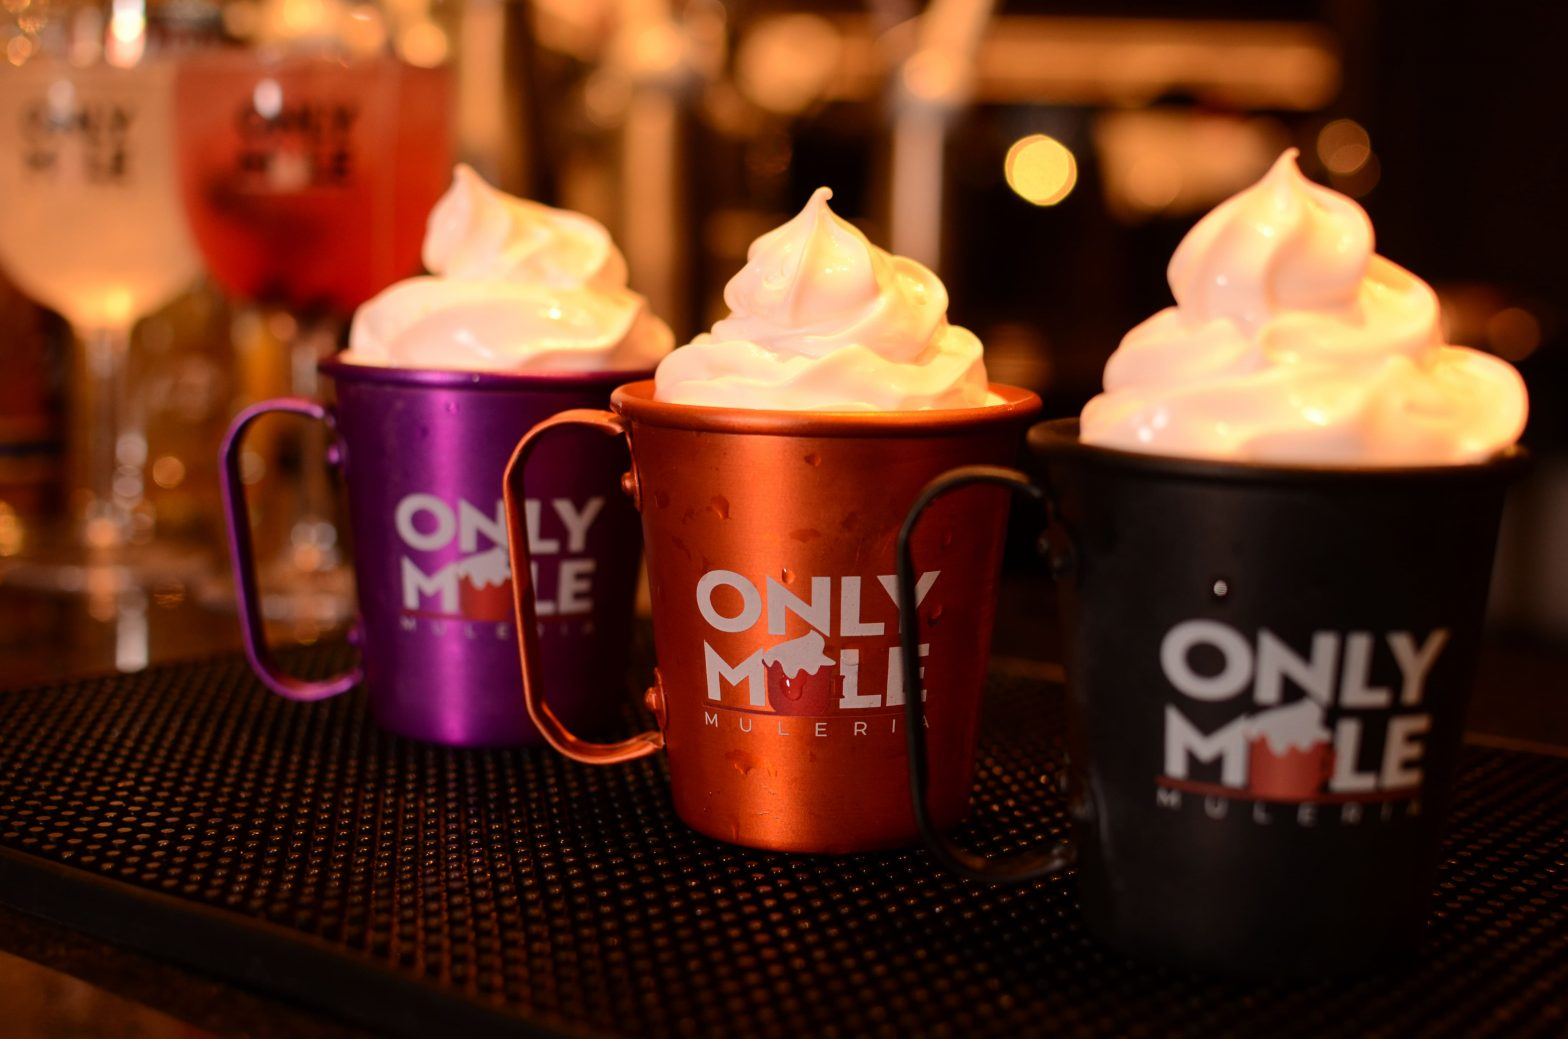 Moscow Mule: conheça esse drink de sucesso na Only Mule!